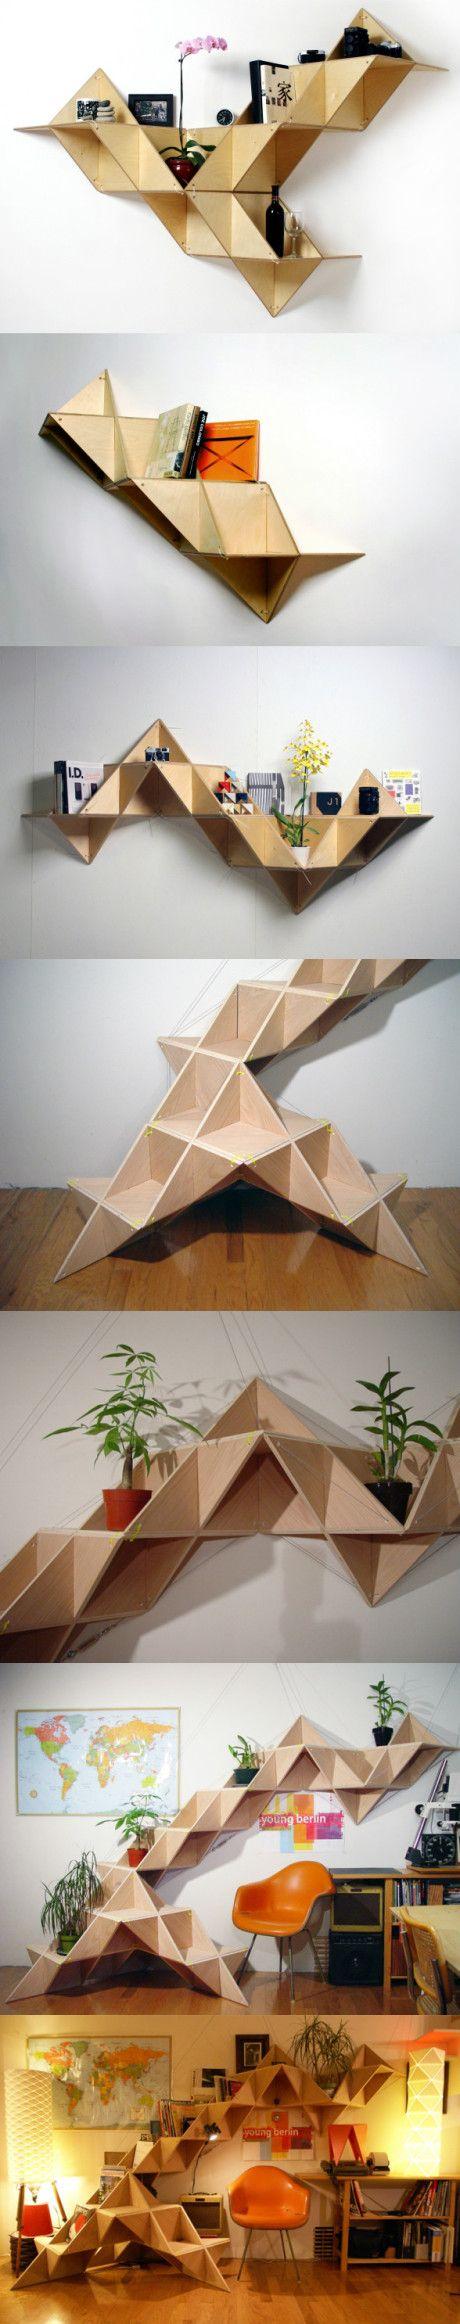 extensible triangle wall shelf